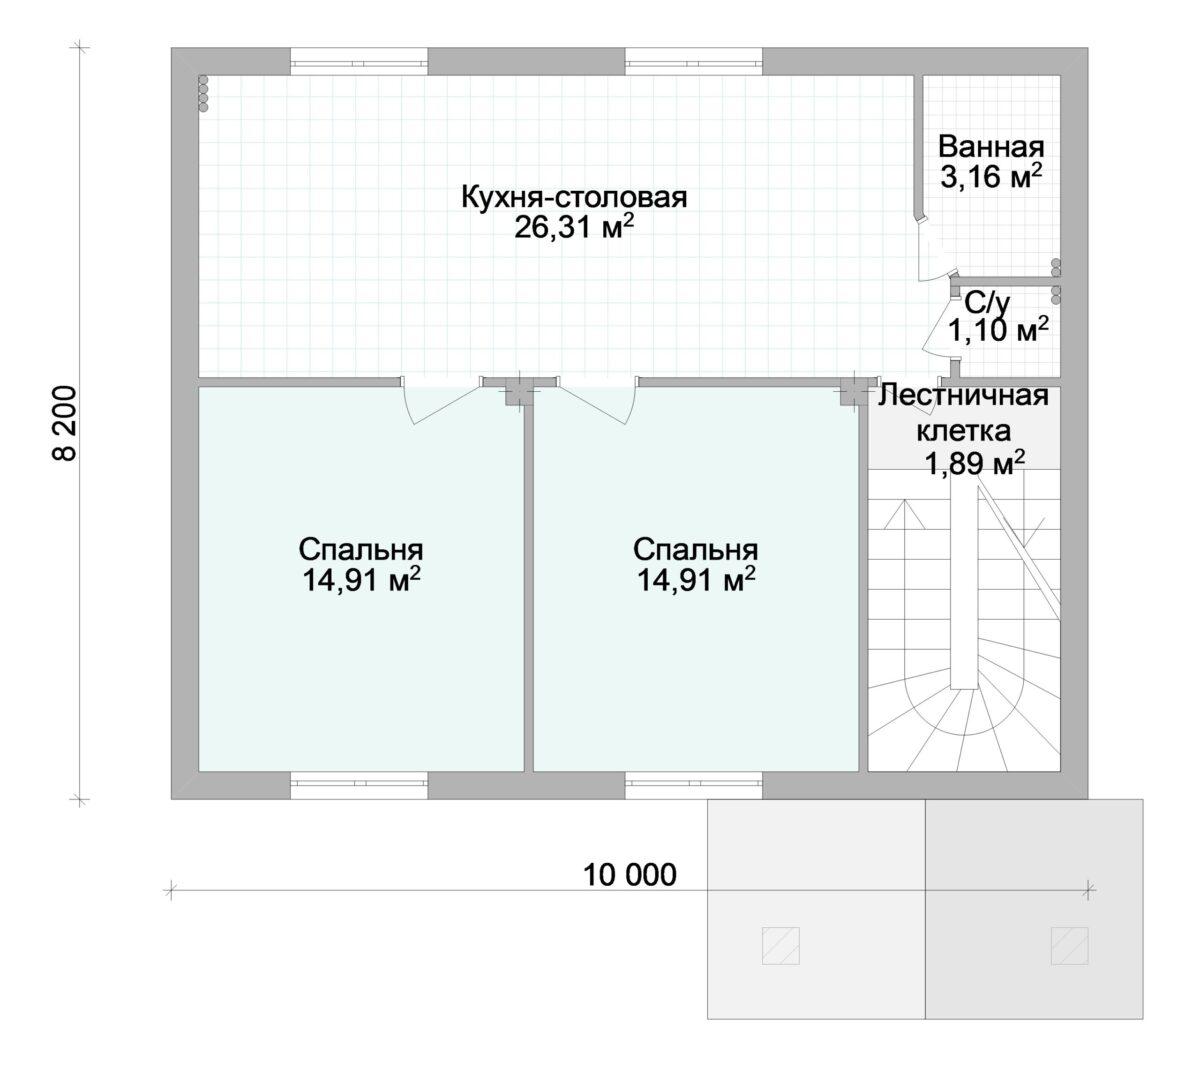 Уайт холл B-283. Проект дома на две семьи или коттеджа под гостиницу